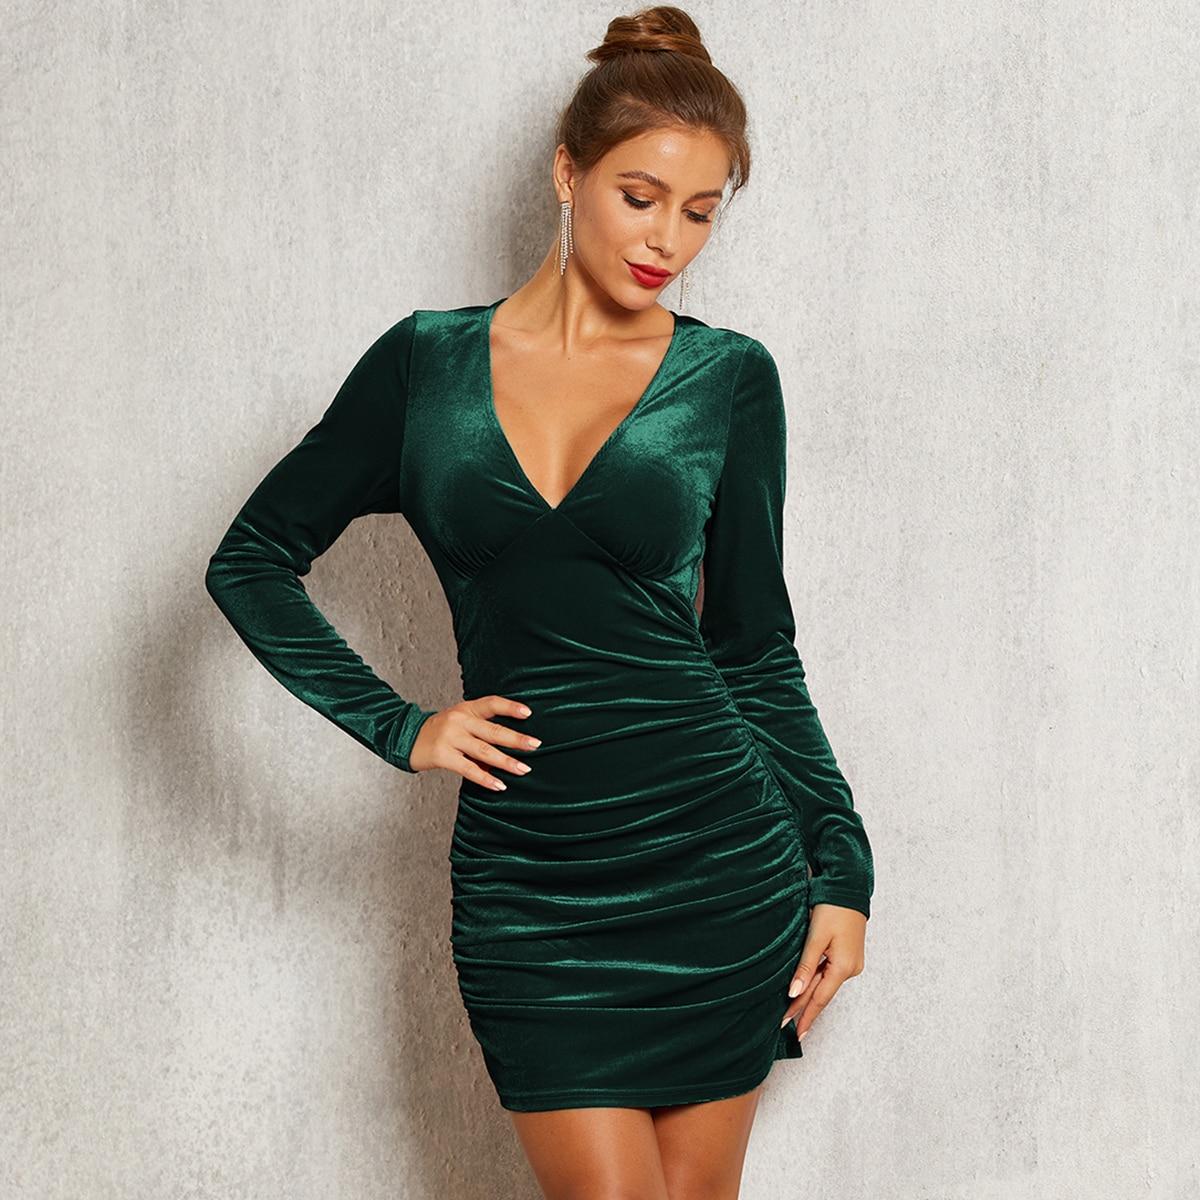 облегающее бархатое платье со складкой SheIn swdress42191023076